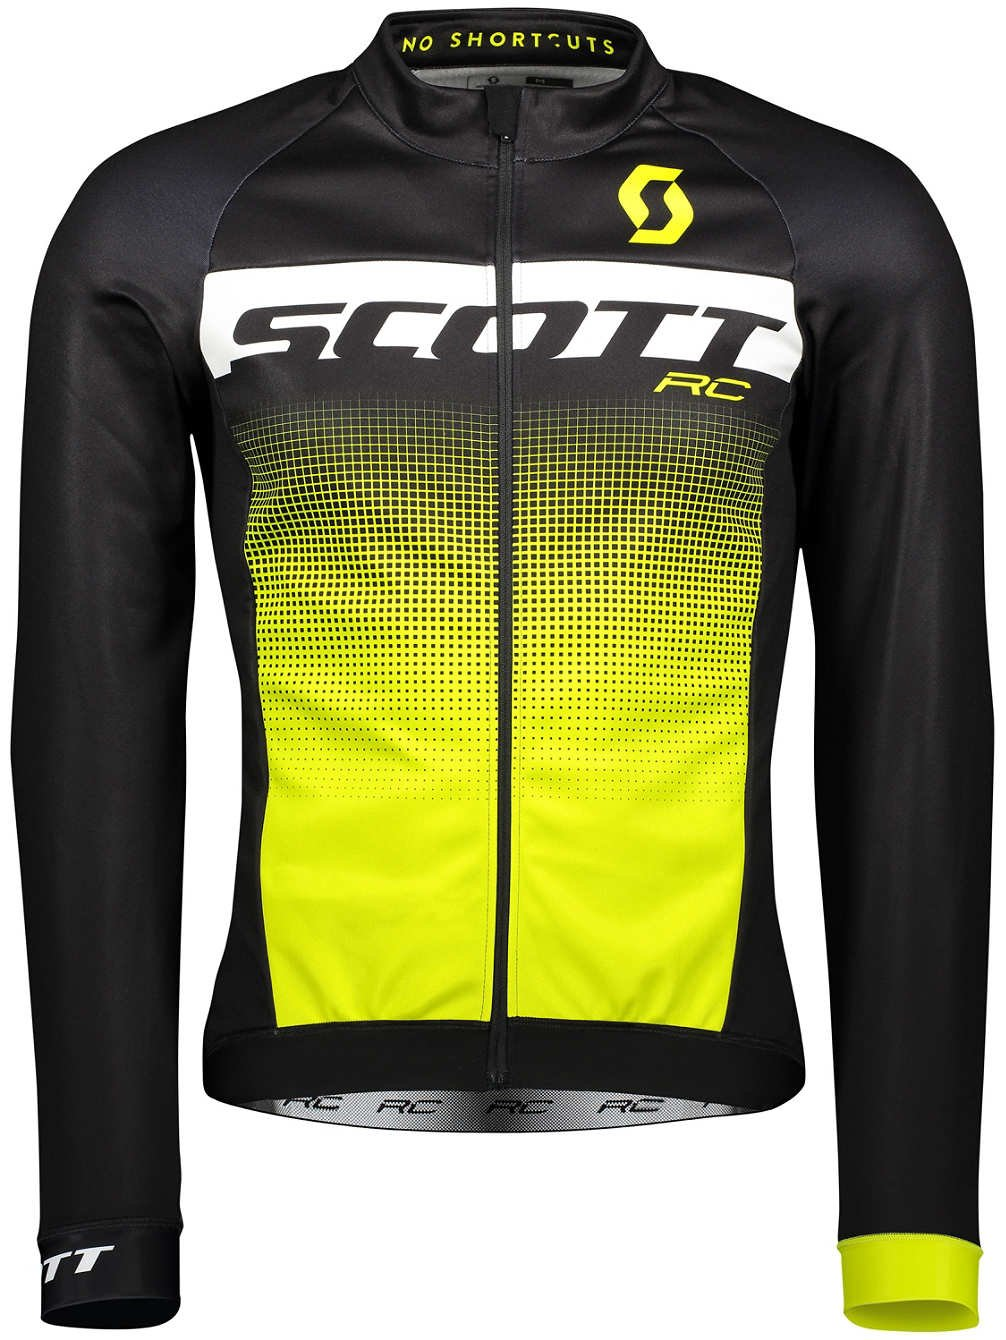 Scott RC AS WP Winter Fahrrad Trikot schwarz/gelb 2018